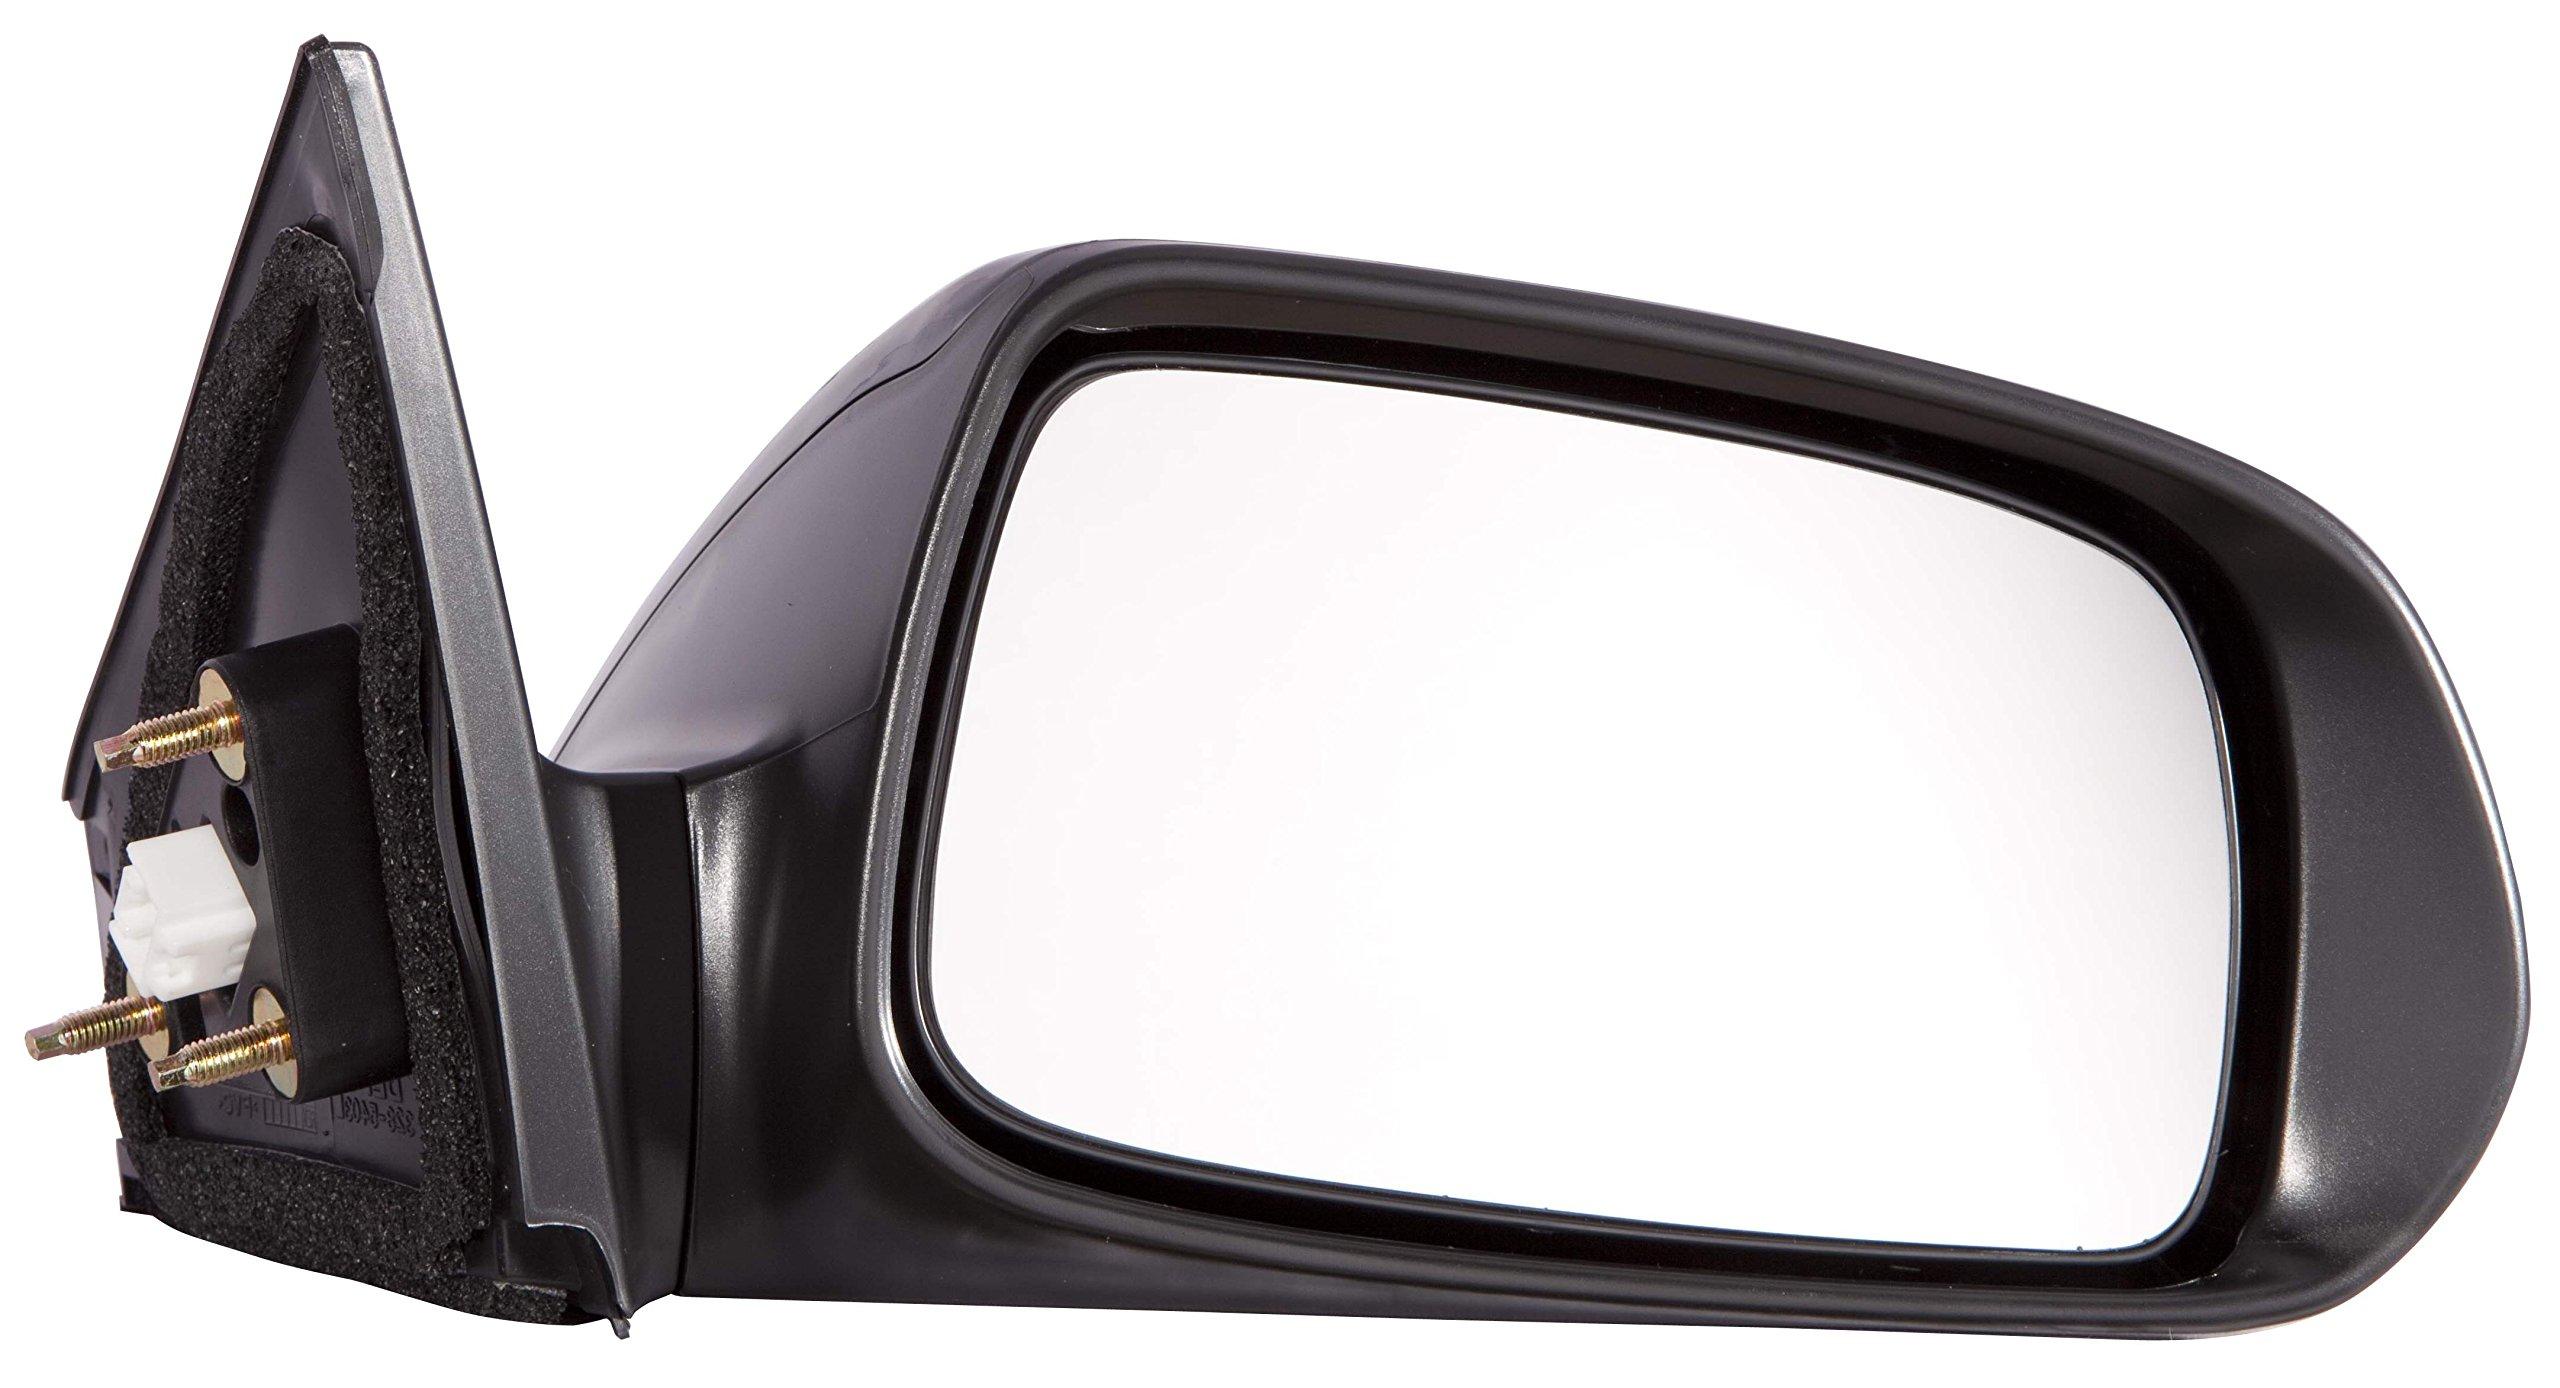 DEPO 328-5403R3EB Scion tC CPE Passenger Side Non-Heated Power Mirror with Turn Signal Lamp